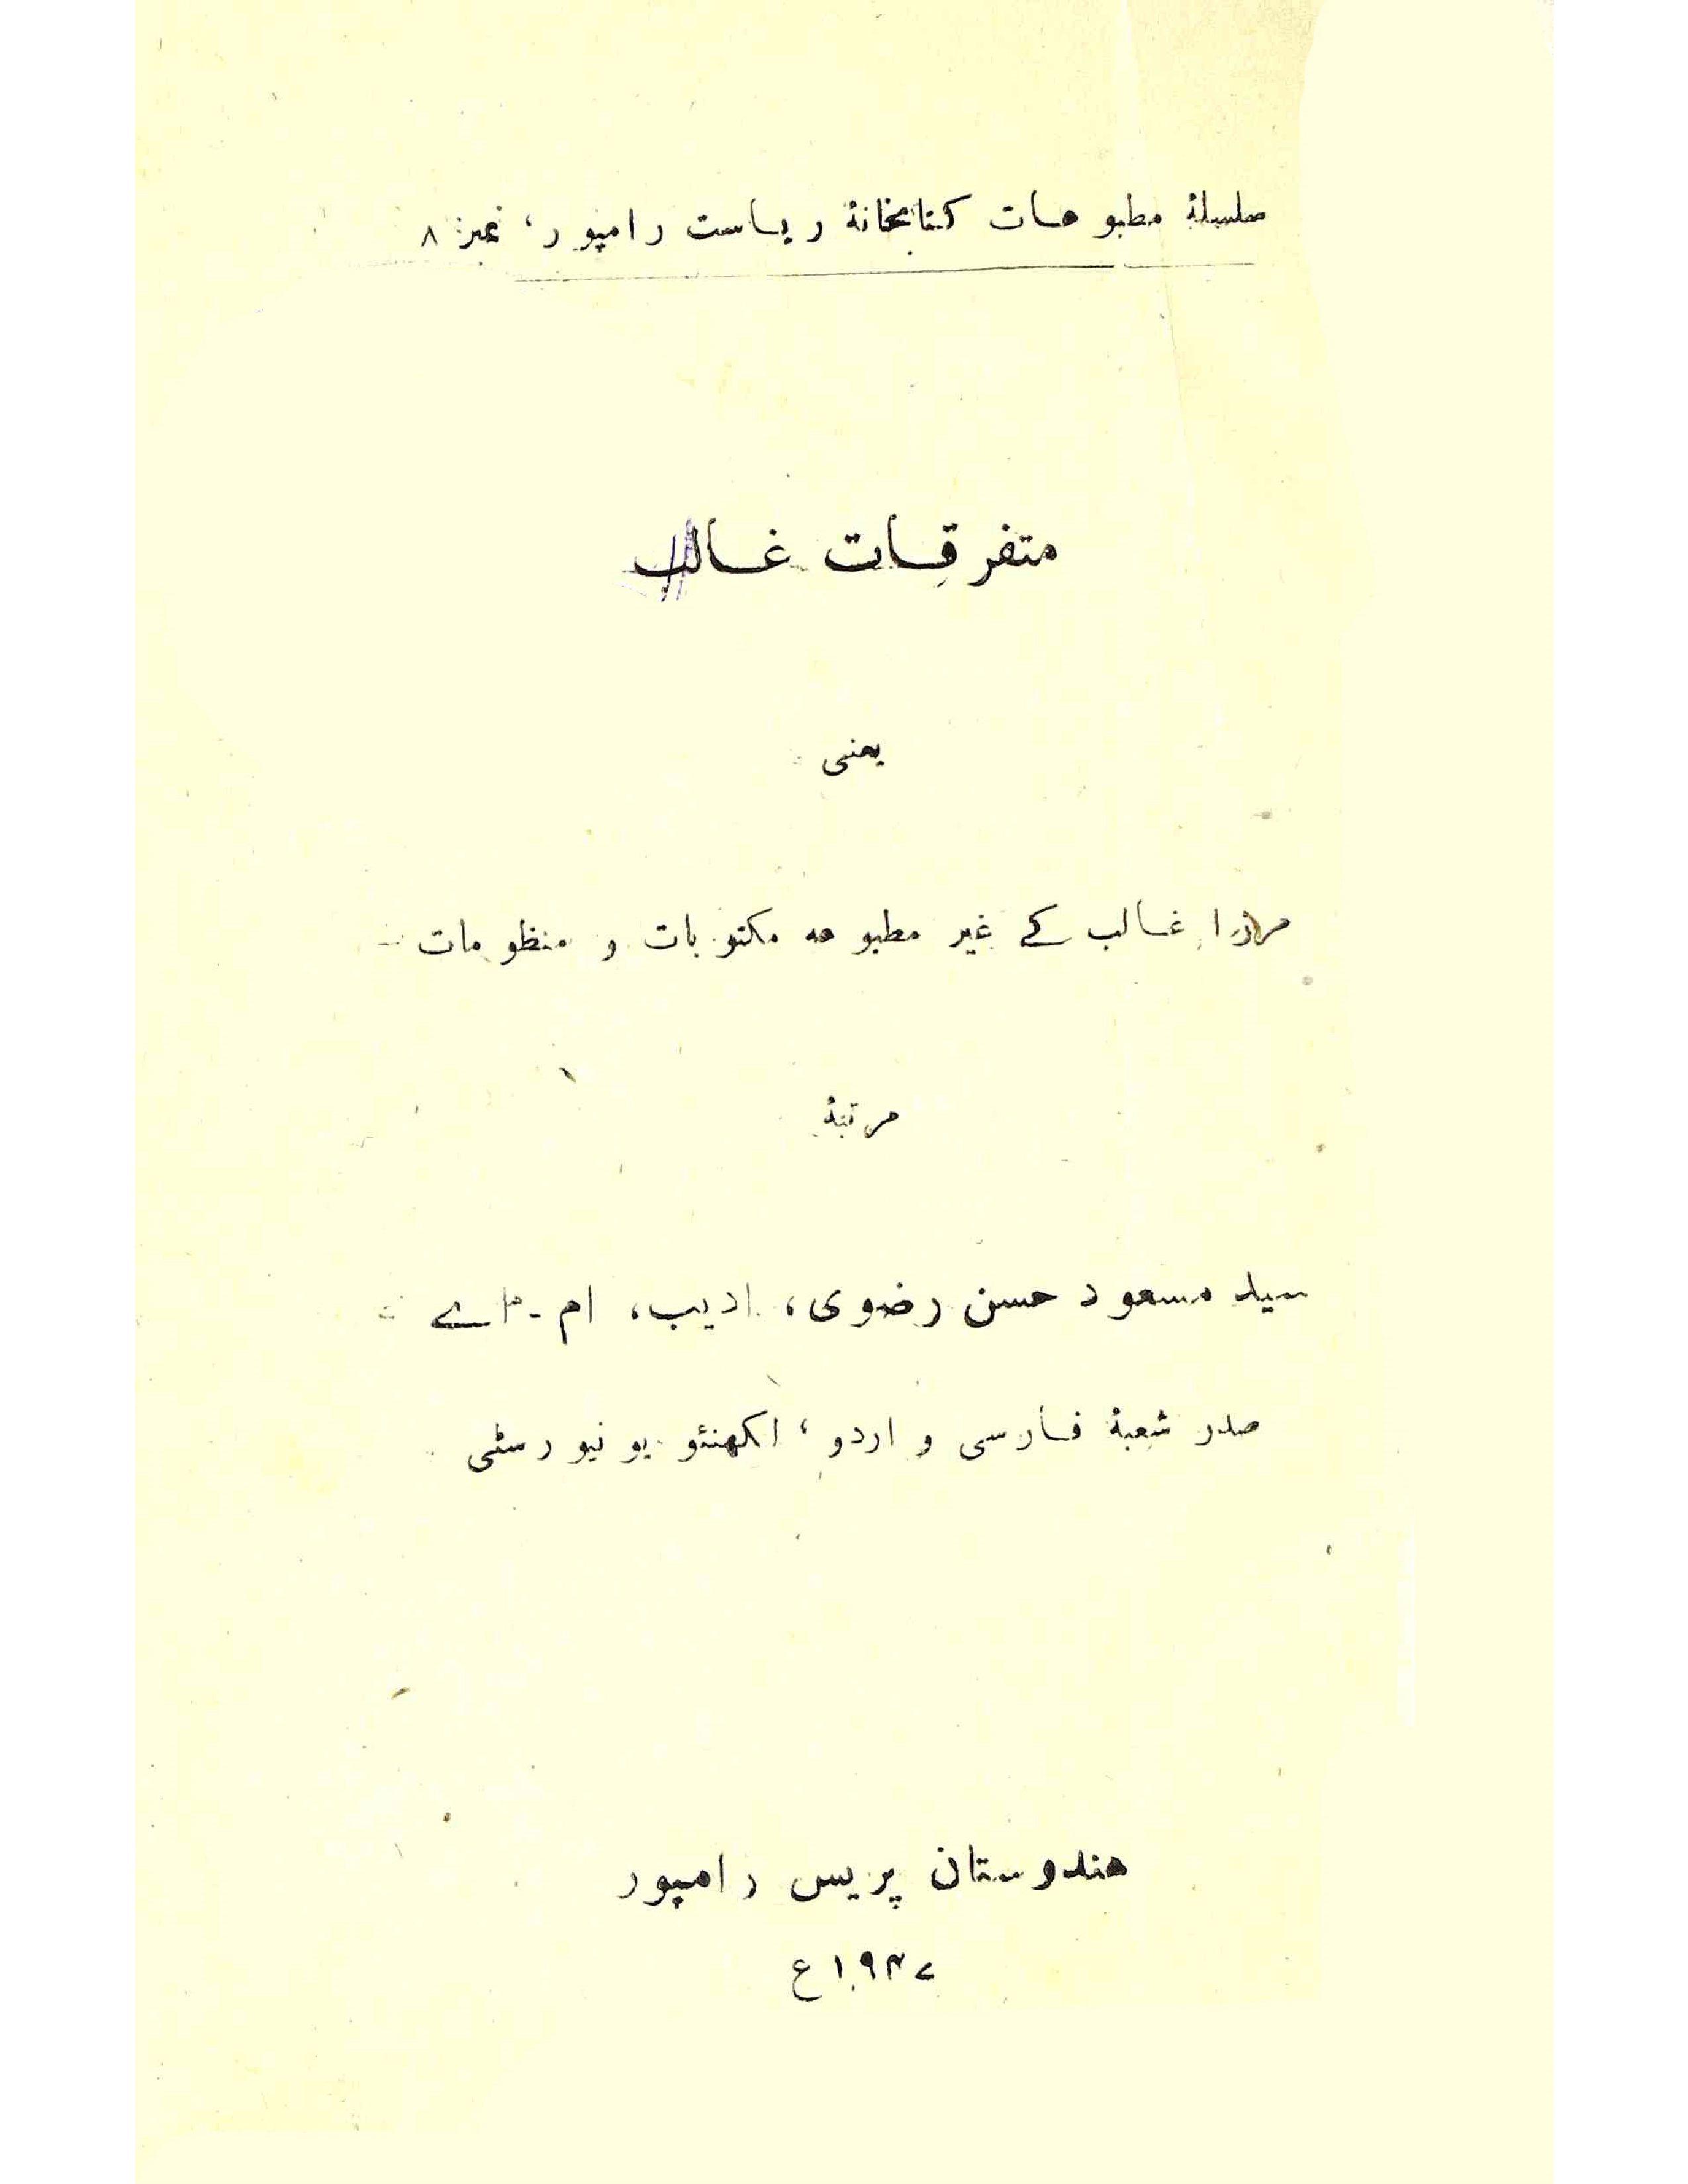 Mutafarriqat-e-Ghalib     Mirzaa Ghalib Ke Ghair Matbua Maktubaat-o-Manzoomaat